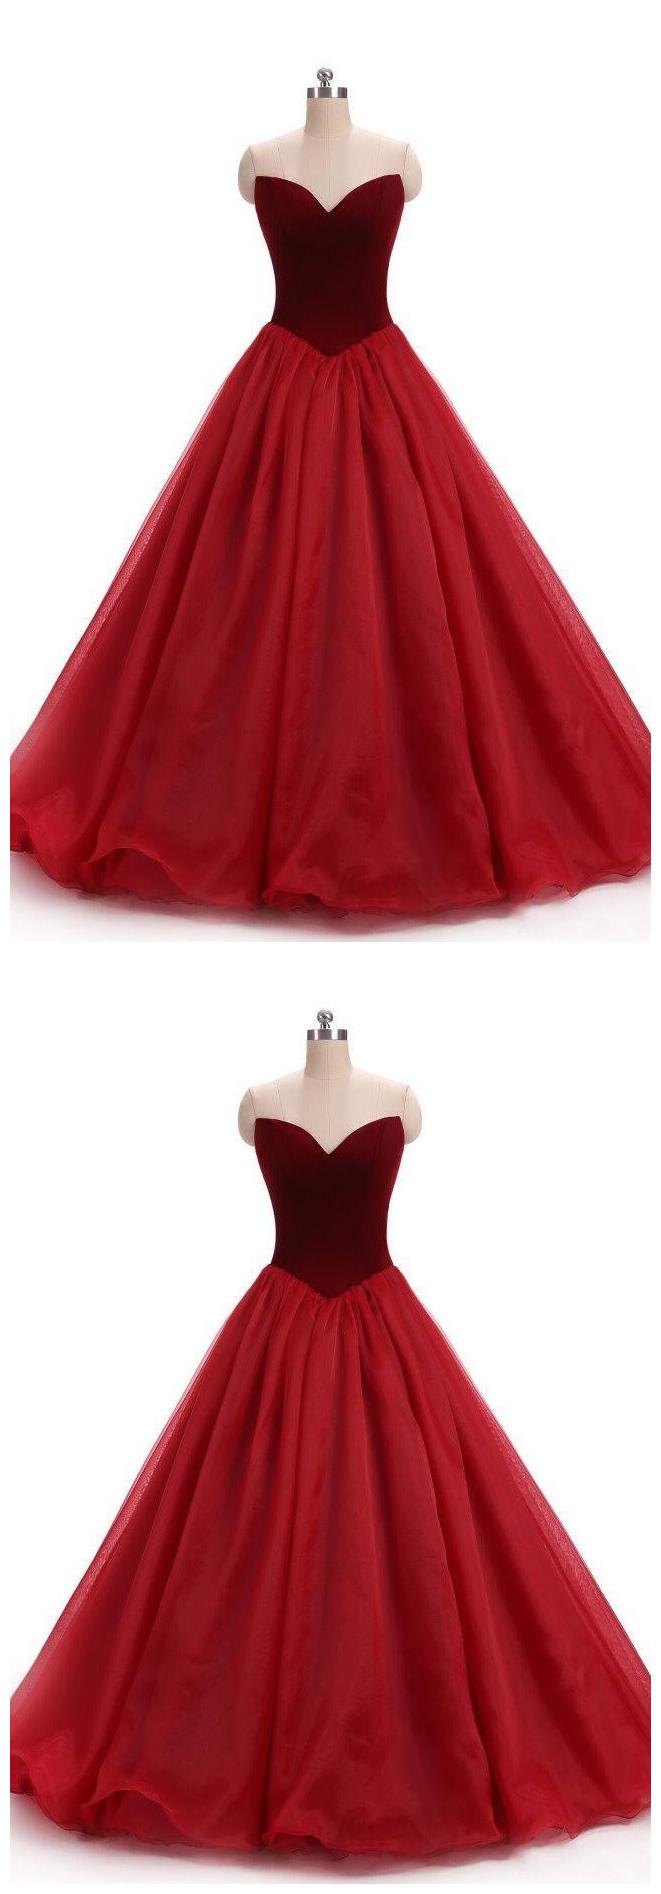 Prom dressesburgundy prom dressestulle prom party dresses